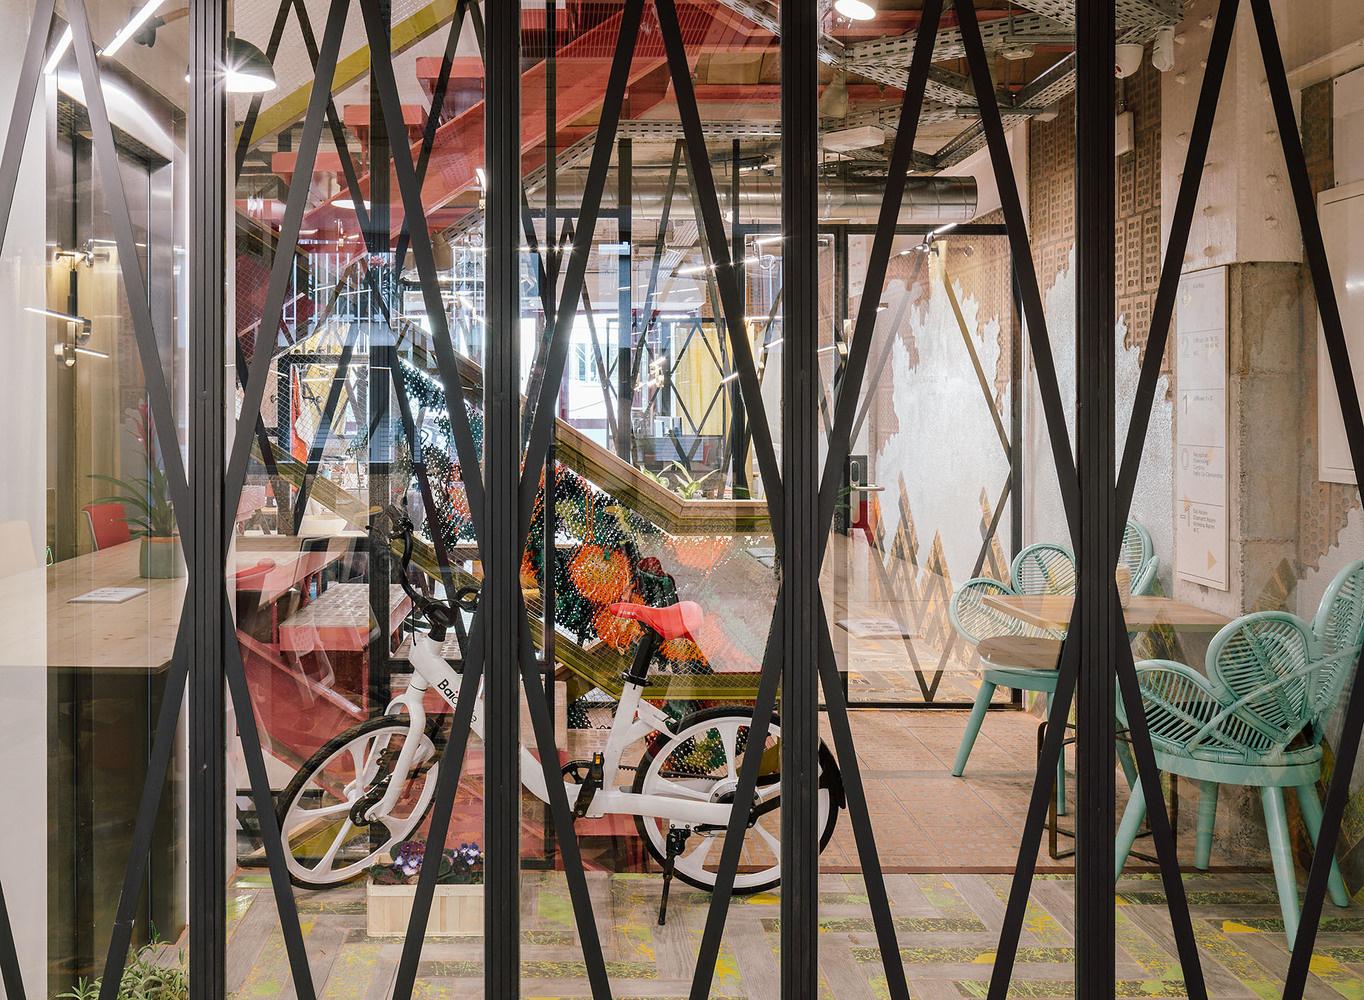 Яркий коворкинг в духе архитектуры Гауди (галерея 10, фото 5)